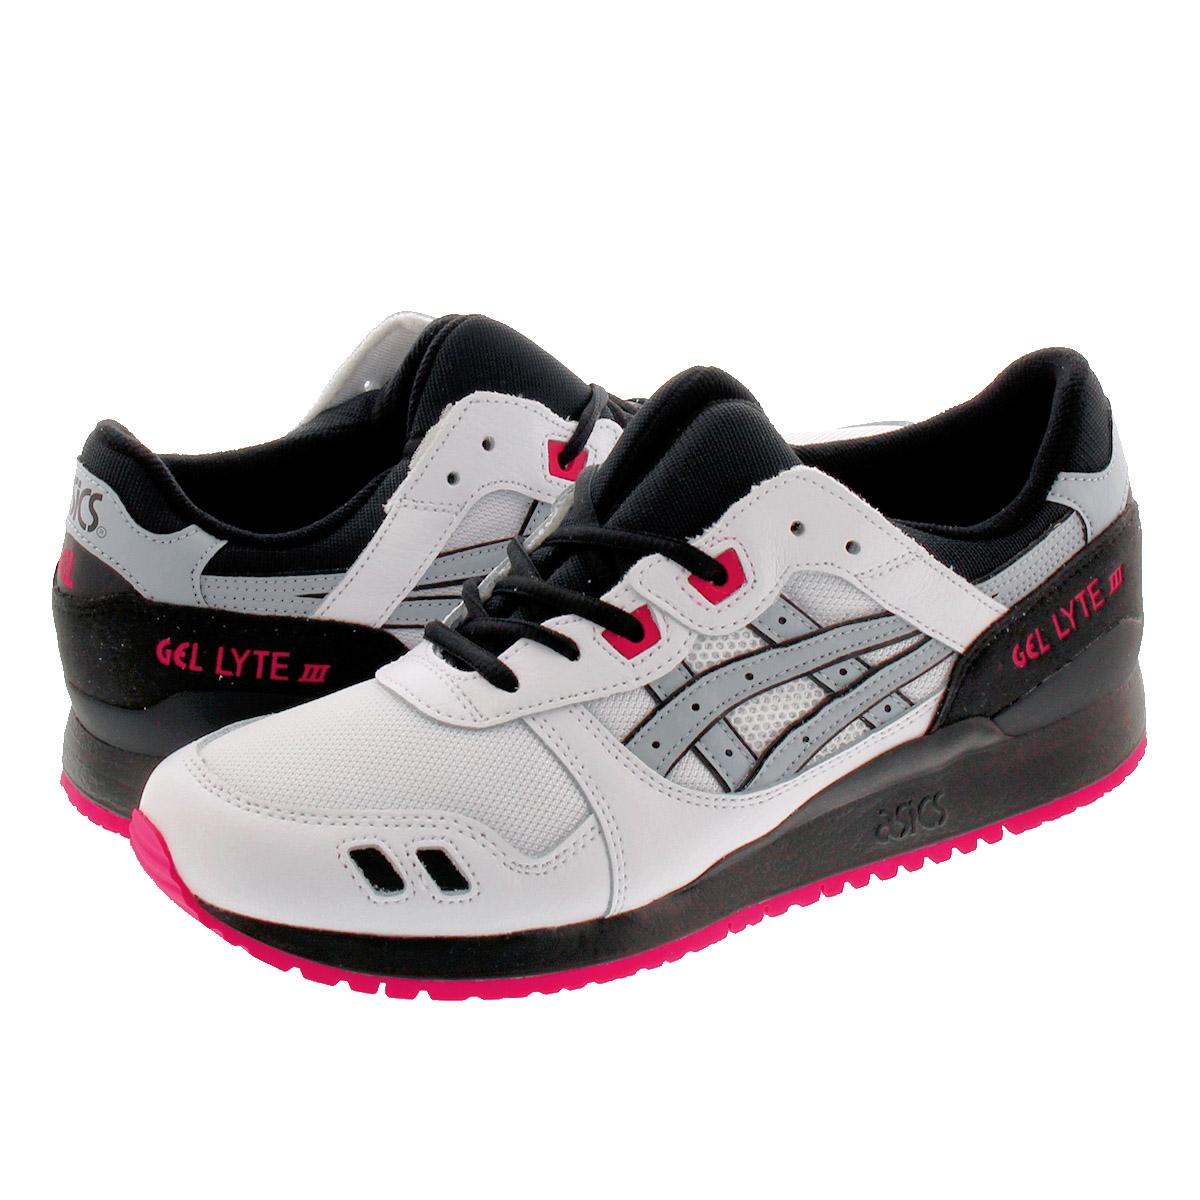 Asics Gel Lyte Iii Shoes Red Grey White spanish